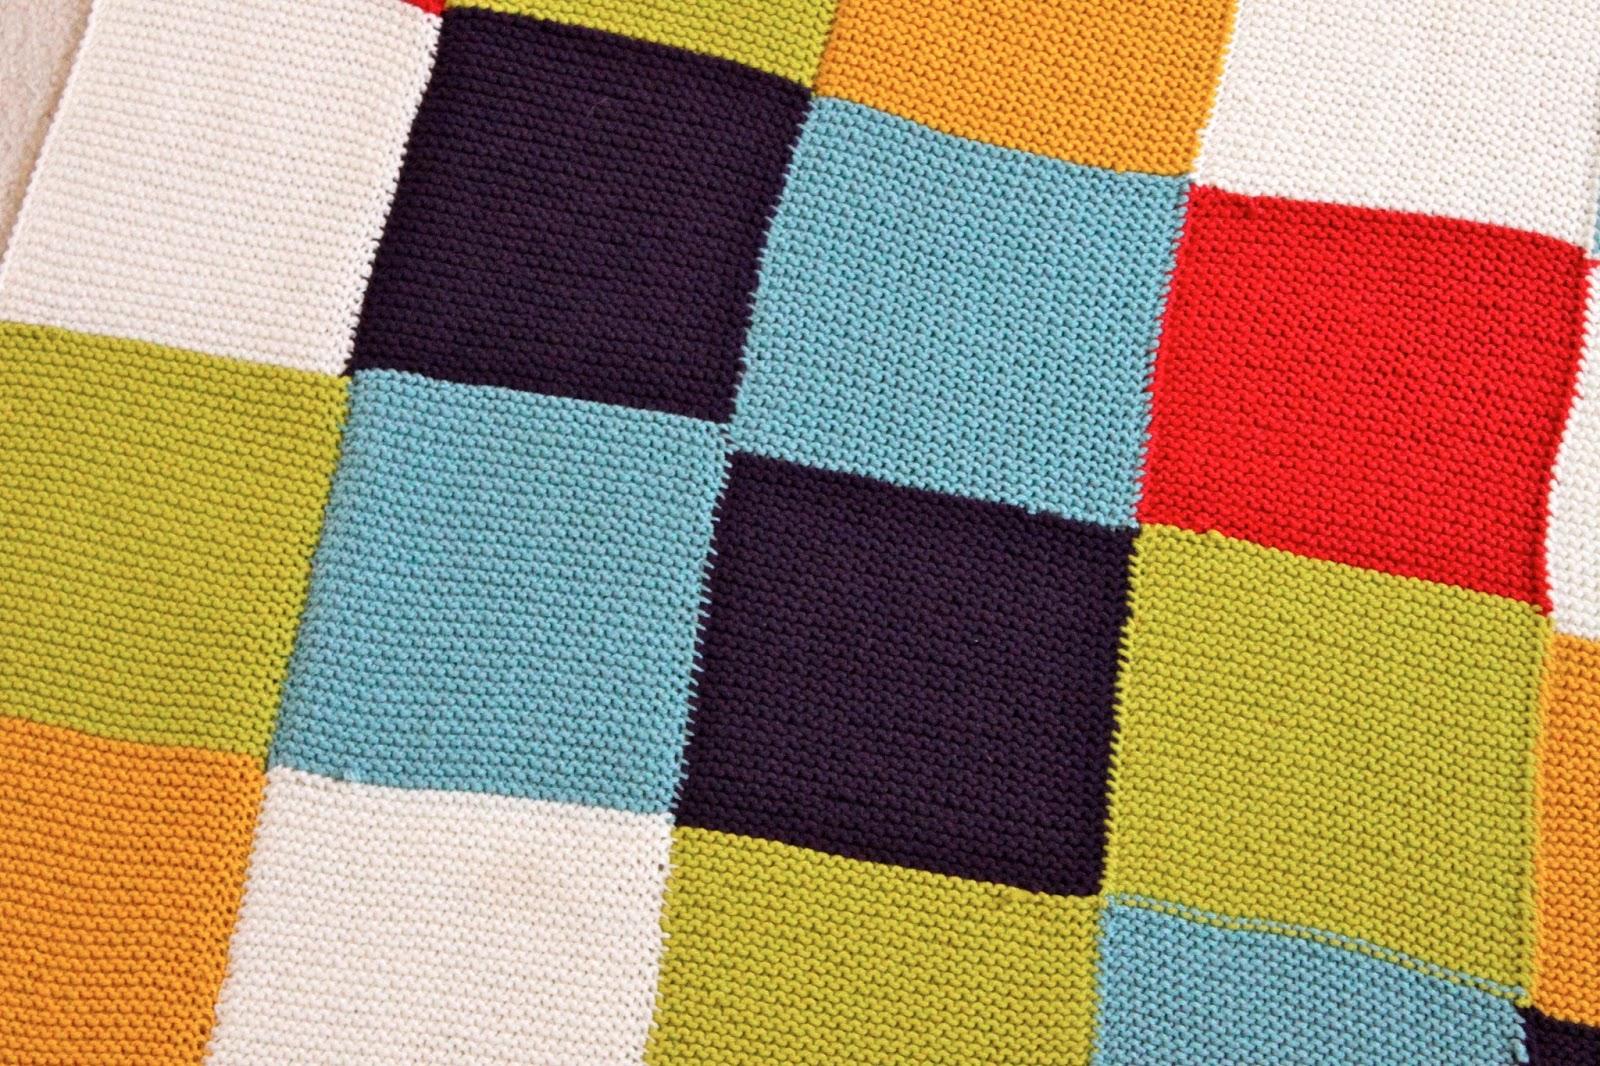 Checkered Knitting Pattern : adventuruss: a checkered knit blanket.